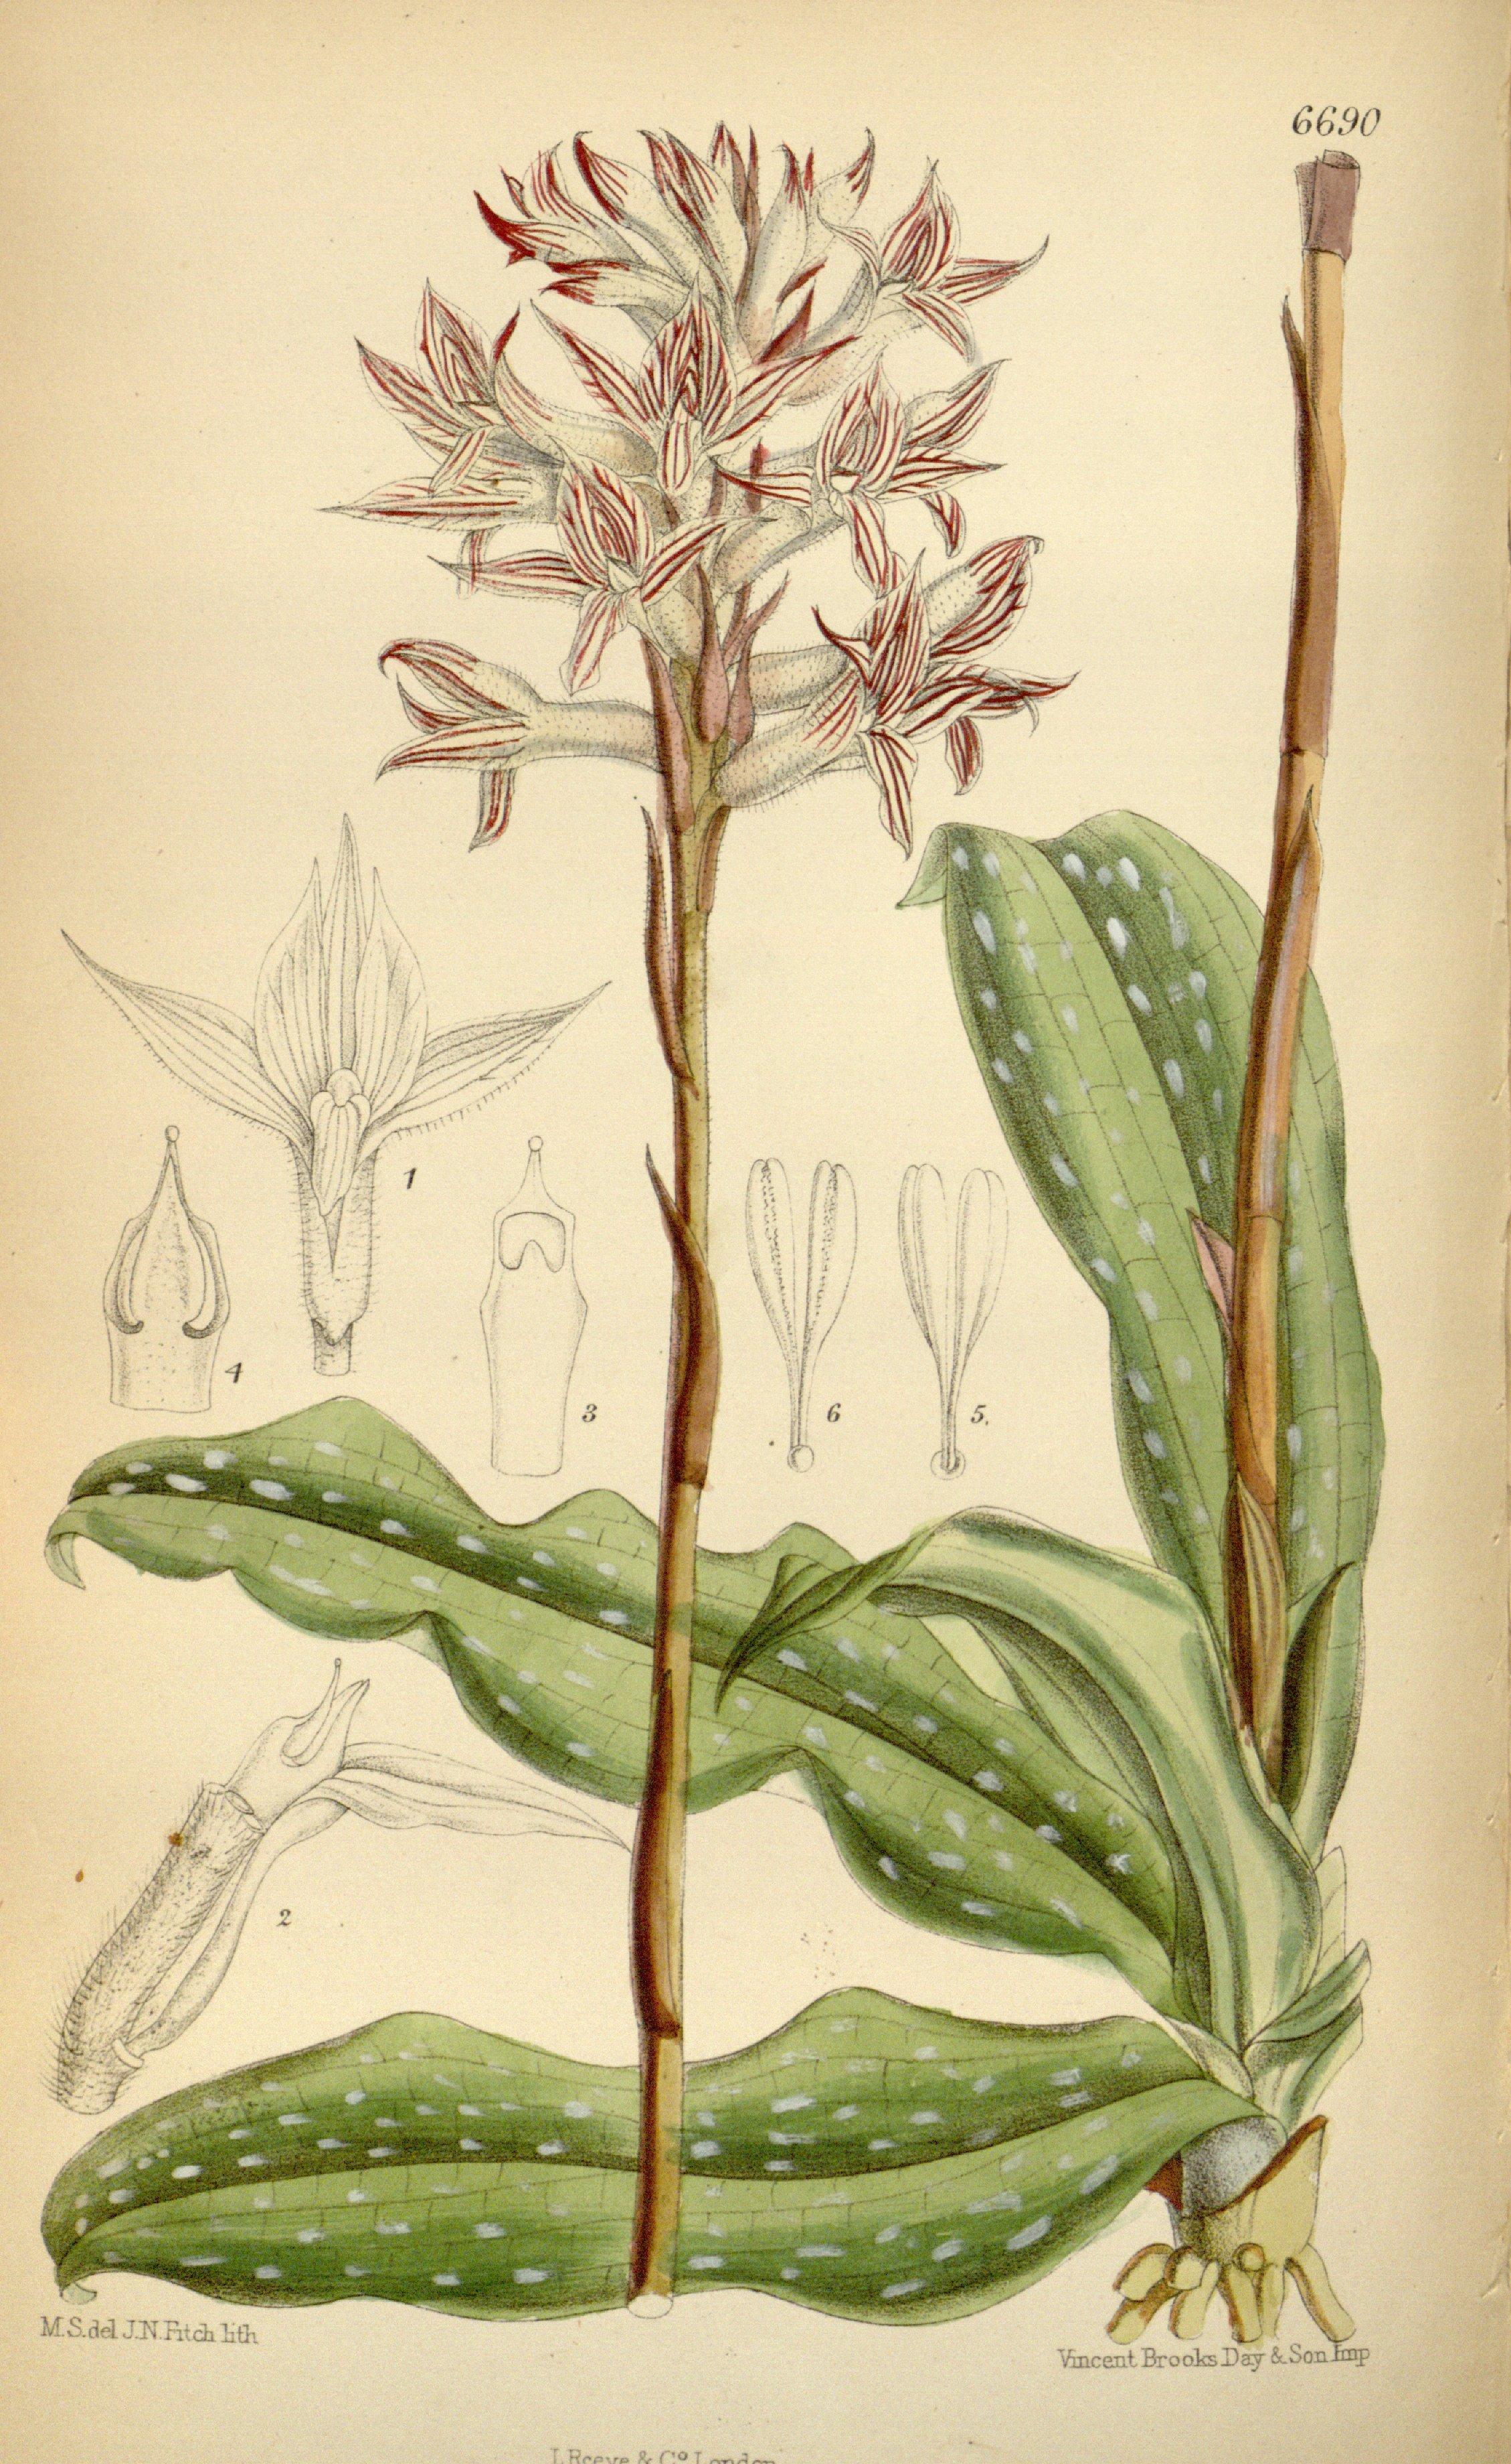 Image of Pteroglossa